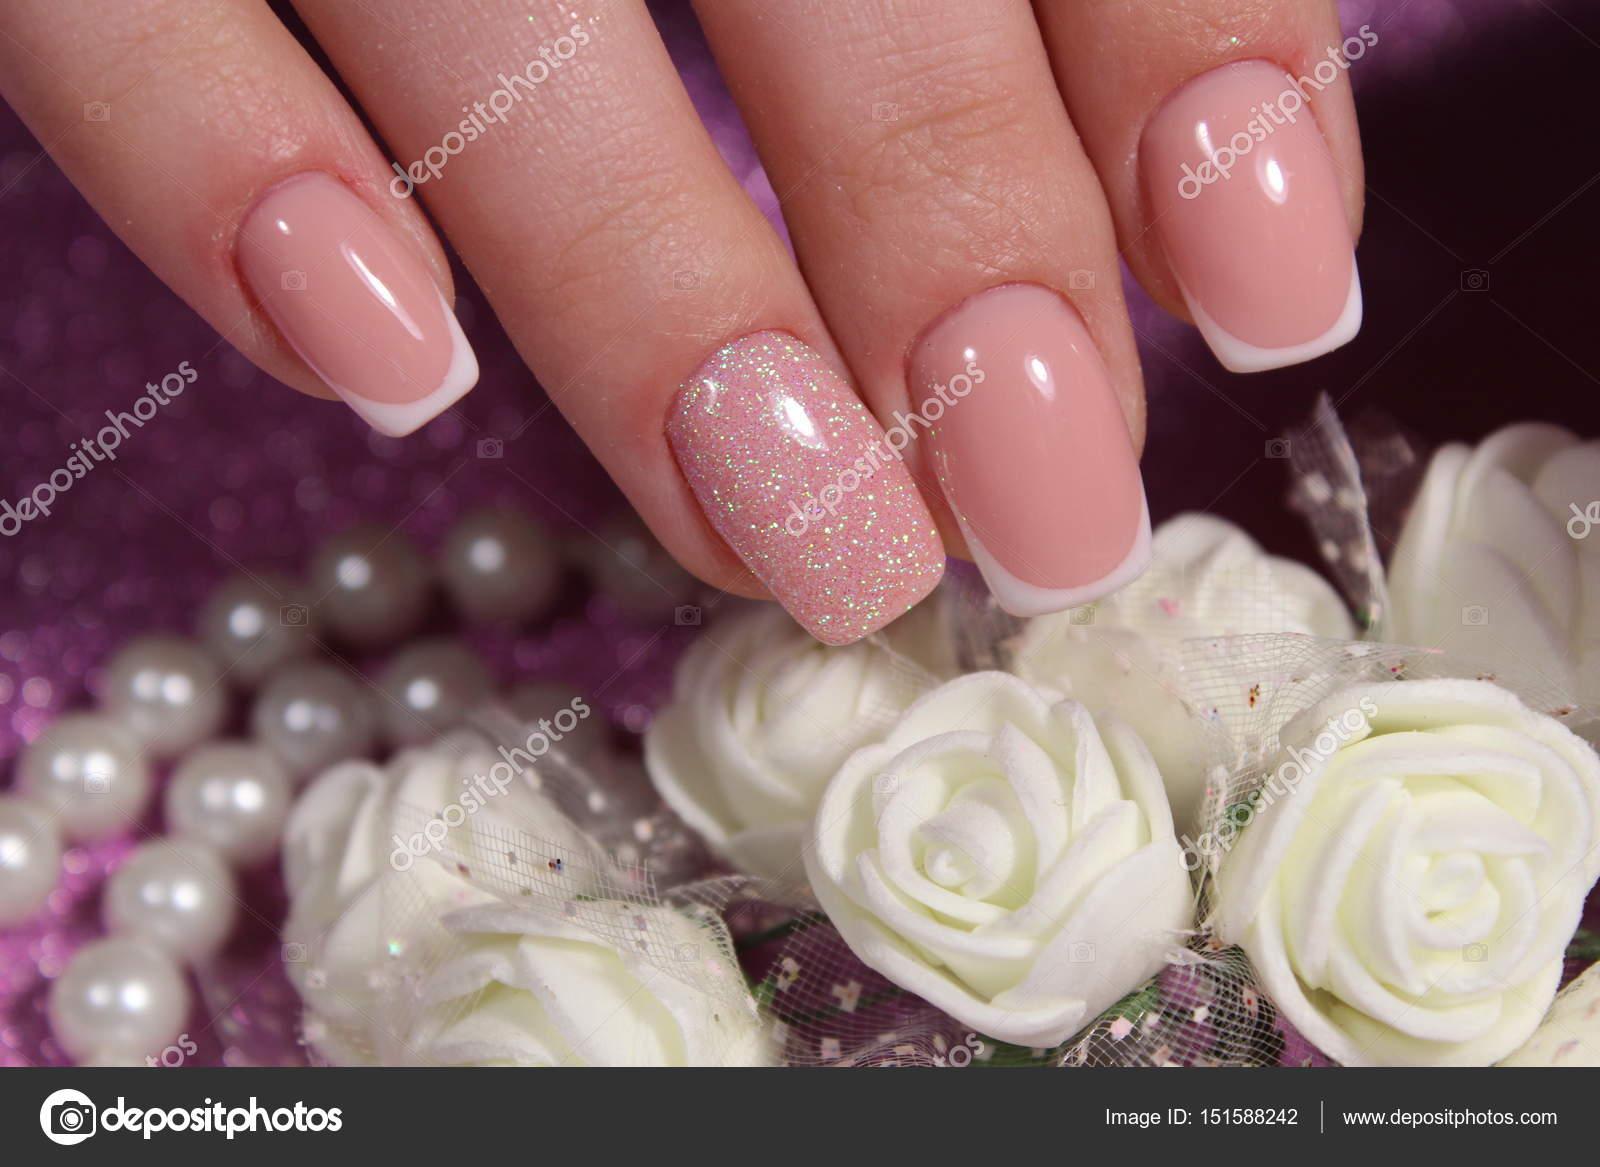 French manicure wedding design — Stock Photo © SmirMaxStock #151588242